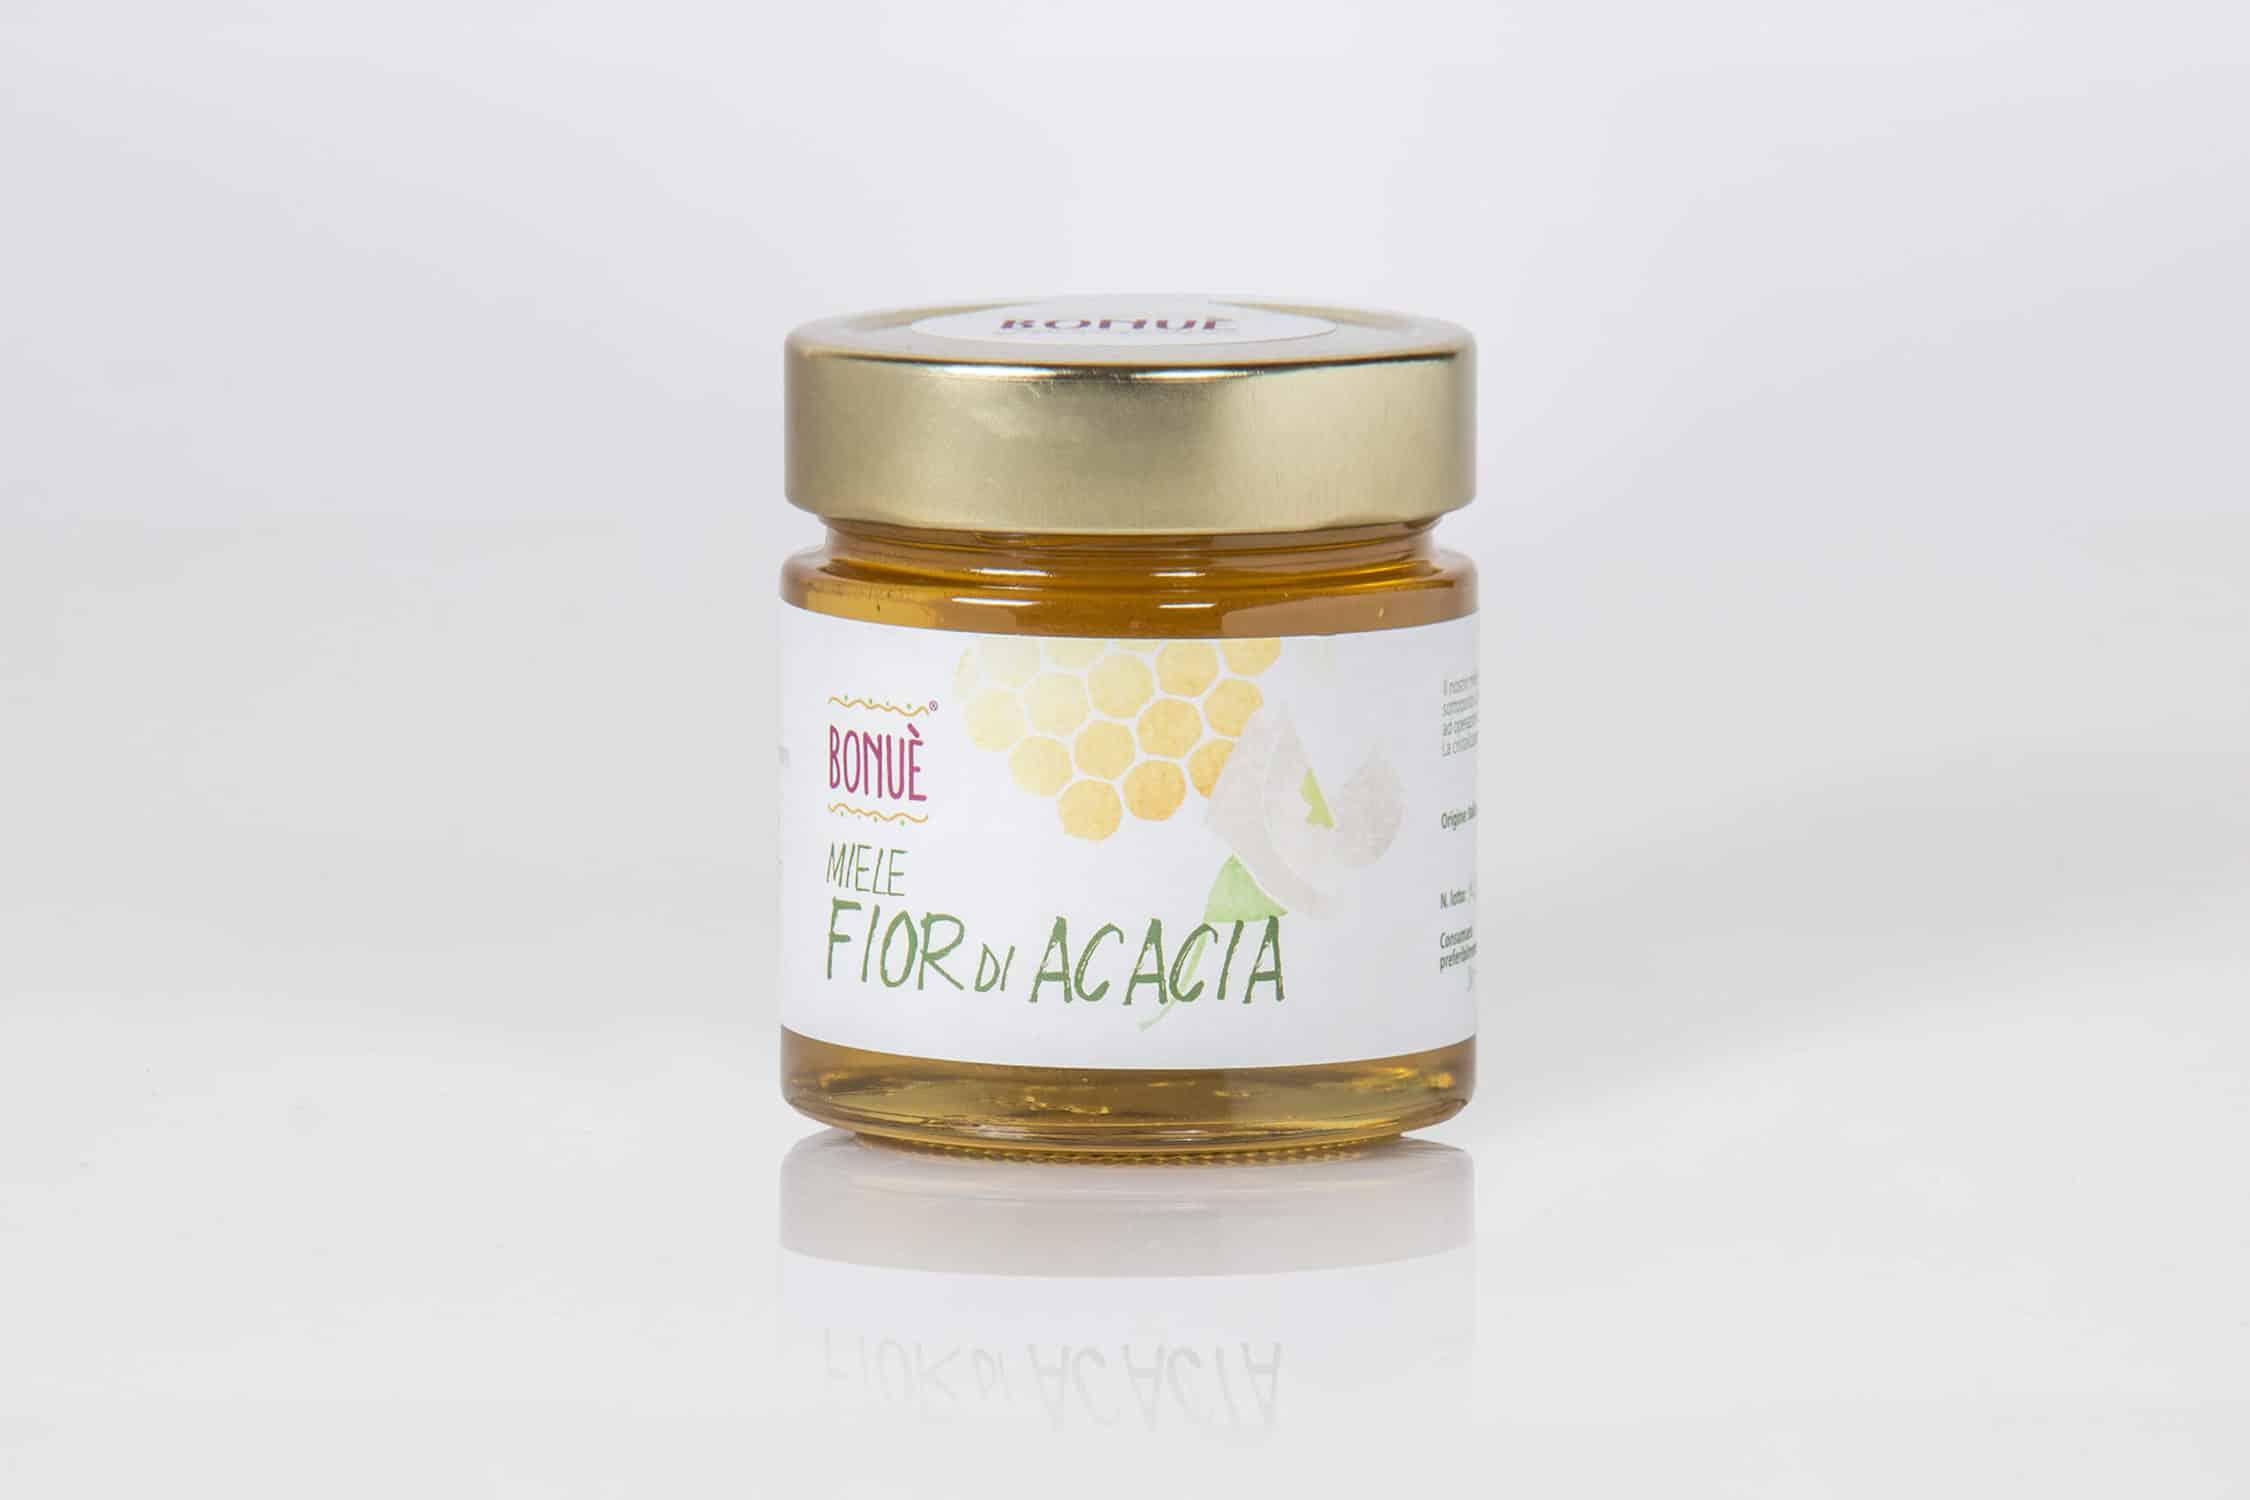 Miele Fior d'Acacia Bonuè vasetto 300g